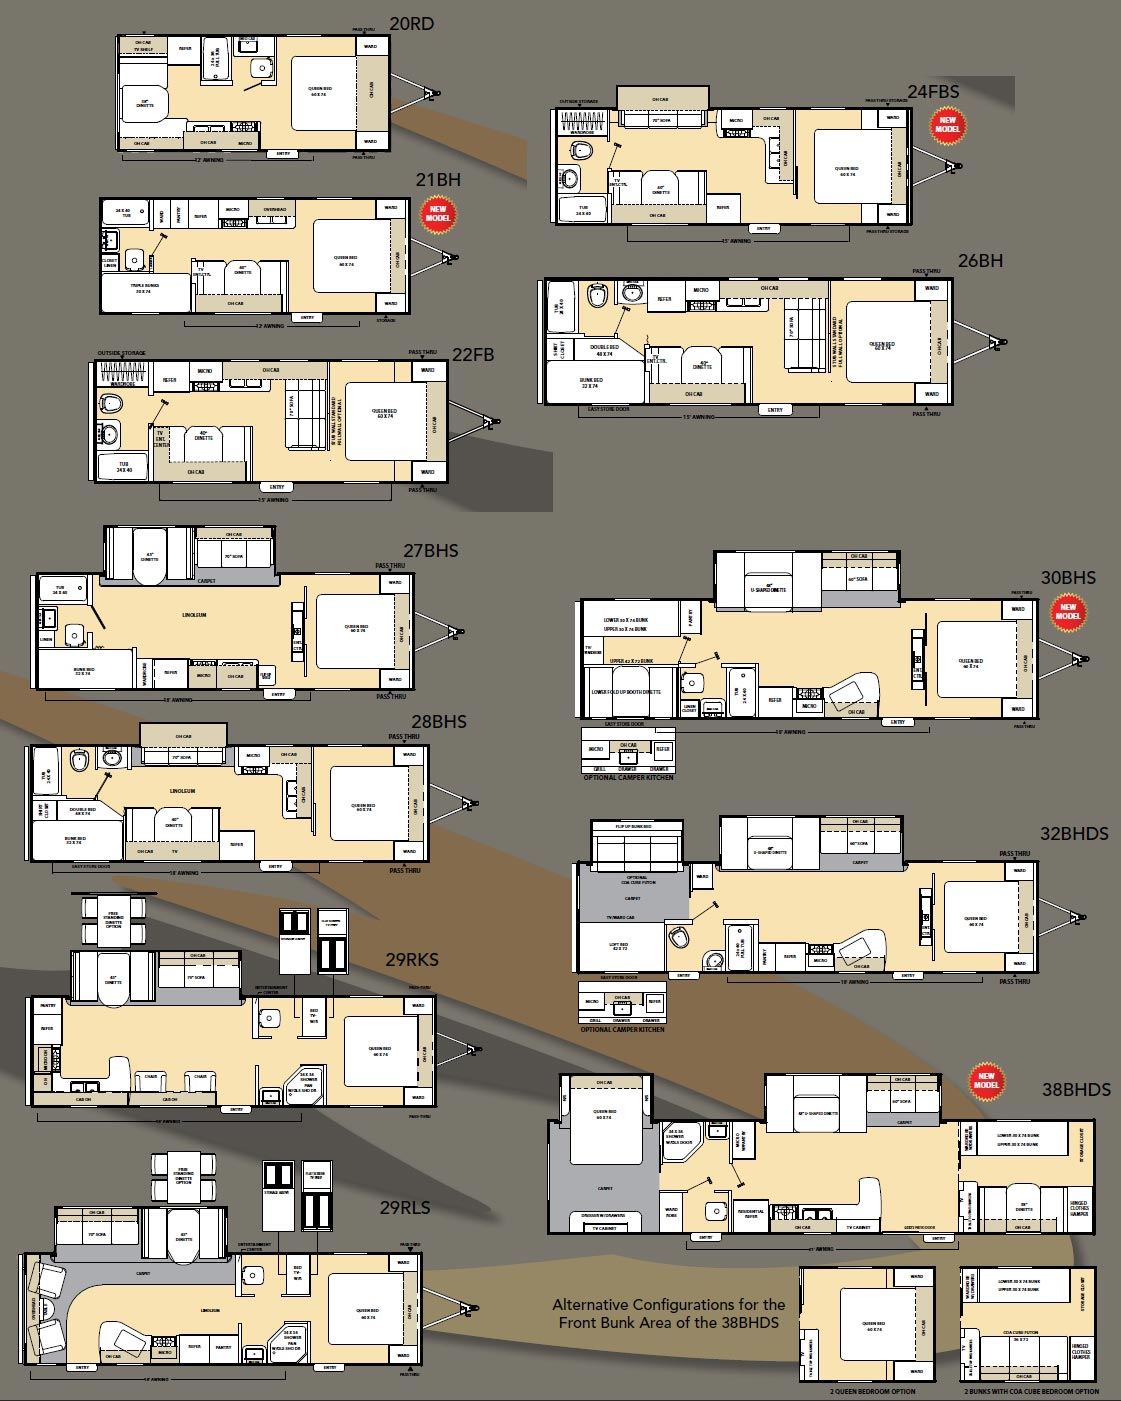 Coachmen Travel Trailers Wiring Diagram Diagrams Schematic A Camper Trailer 1994 Coachman Simple Site M1101